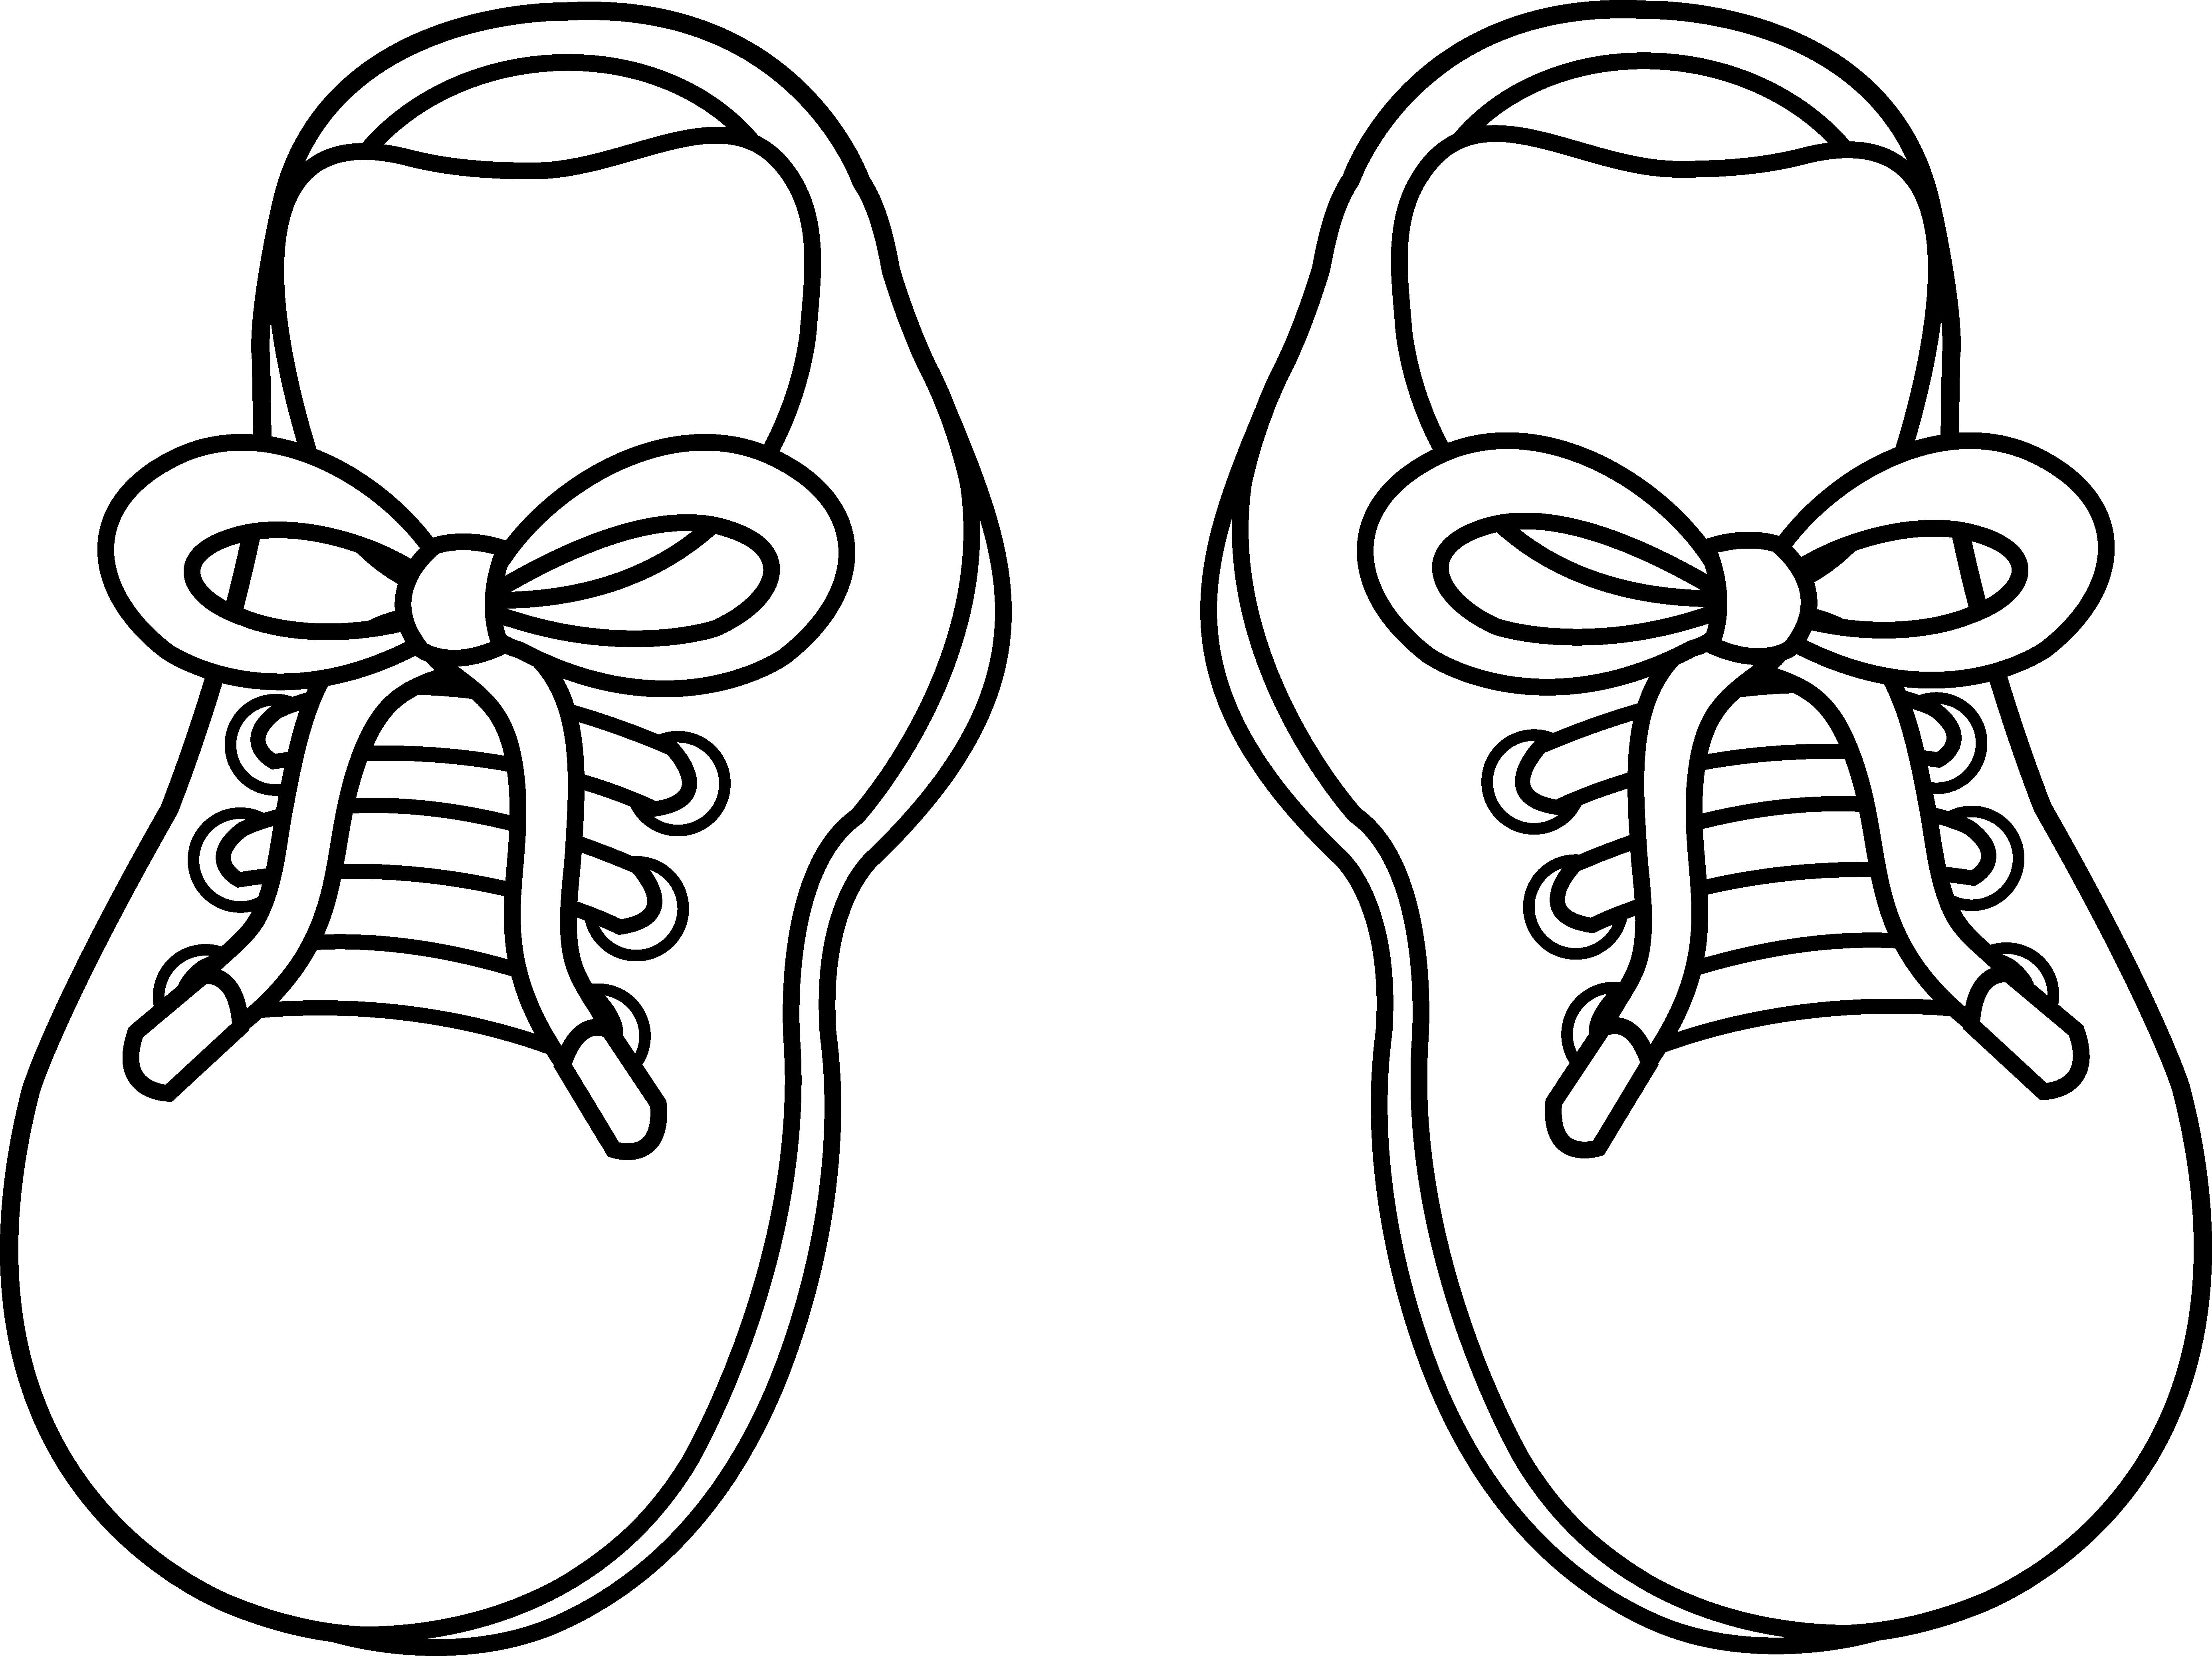 Cartoon Sneakers Clipart-Cartoon Sneakers Clipart-1